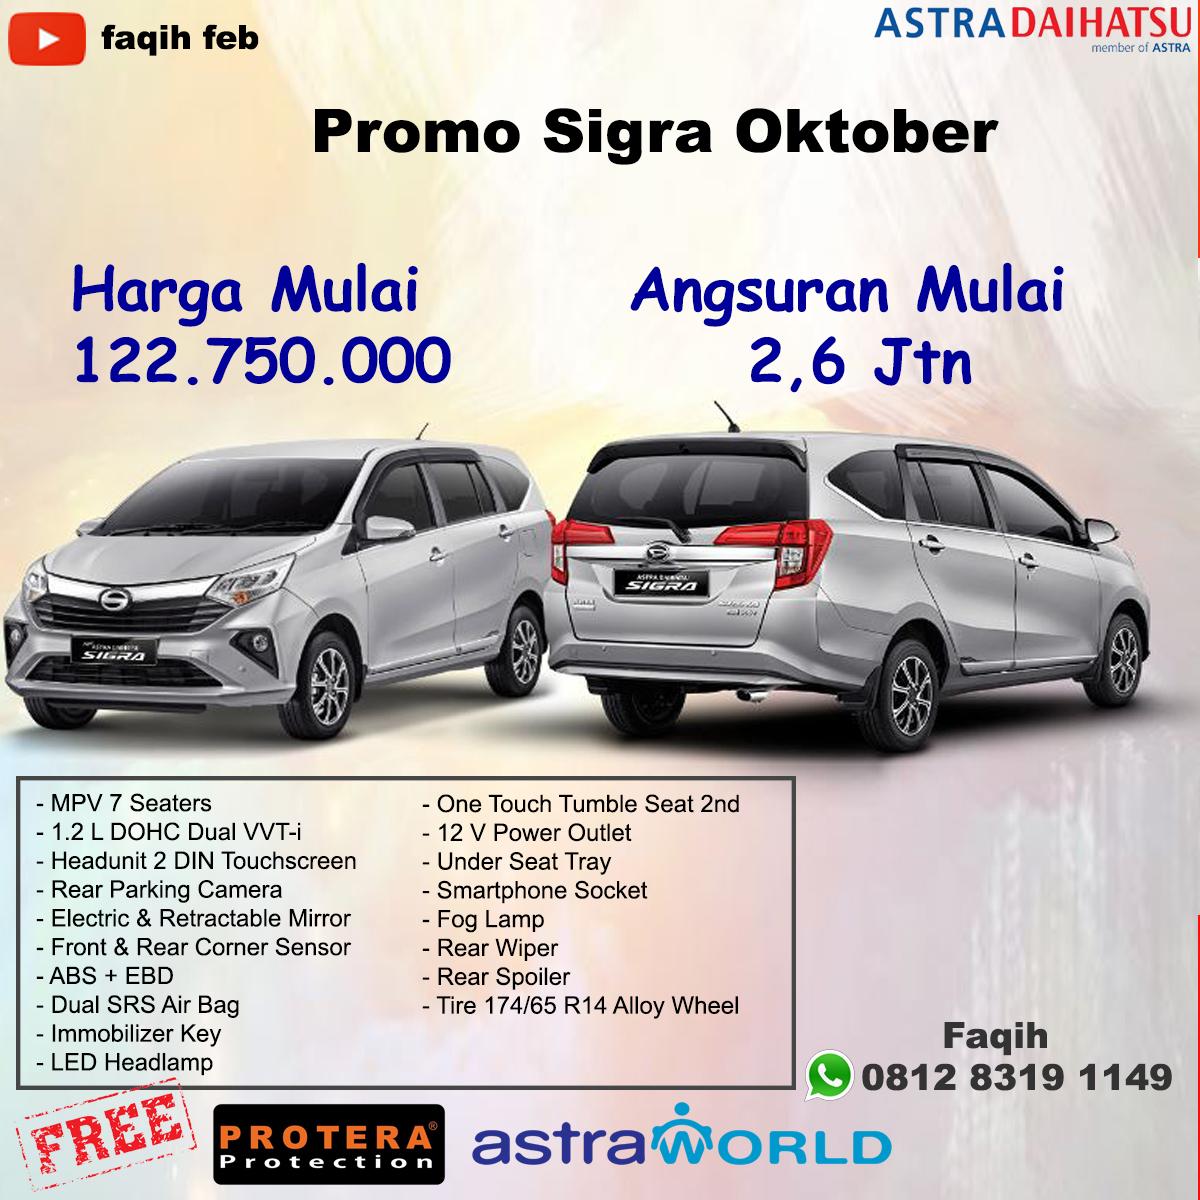 Daihatsu Ciledug Promo-Agustus-2020-ACC-oktober-2020 PROMO DAIHATSU Tangerang SIGRA DP 17 Juta ANGSURAN 2,6 Juta